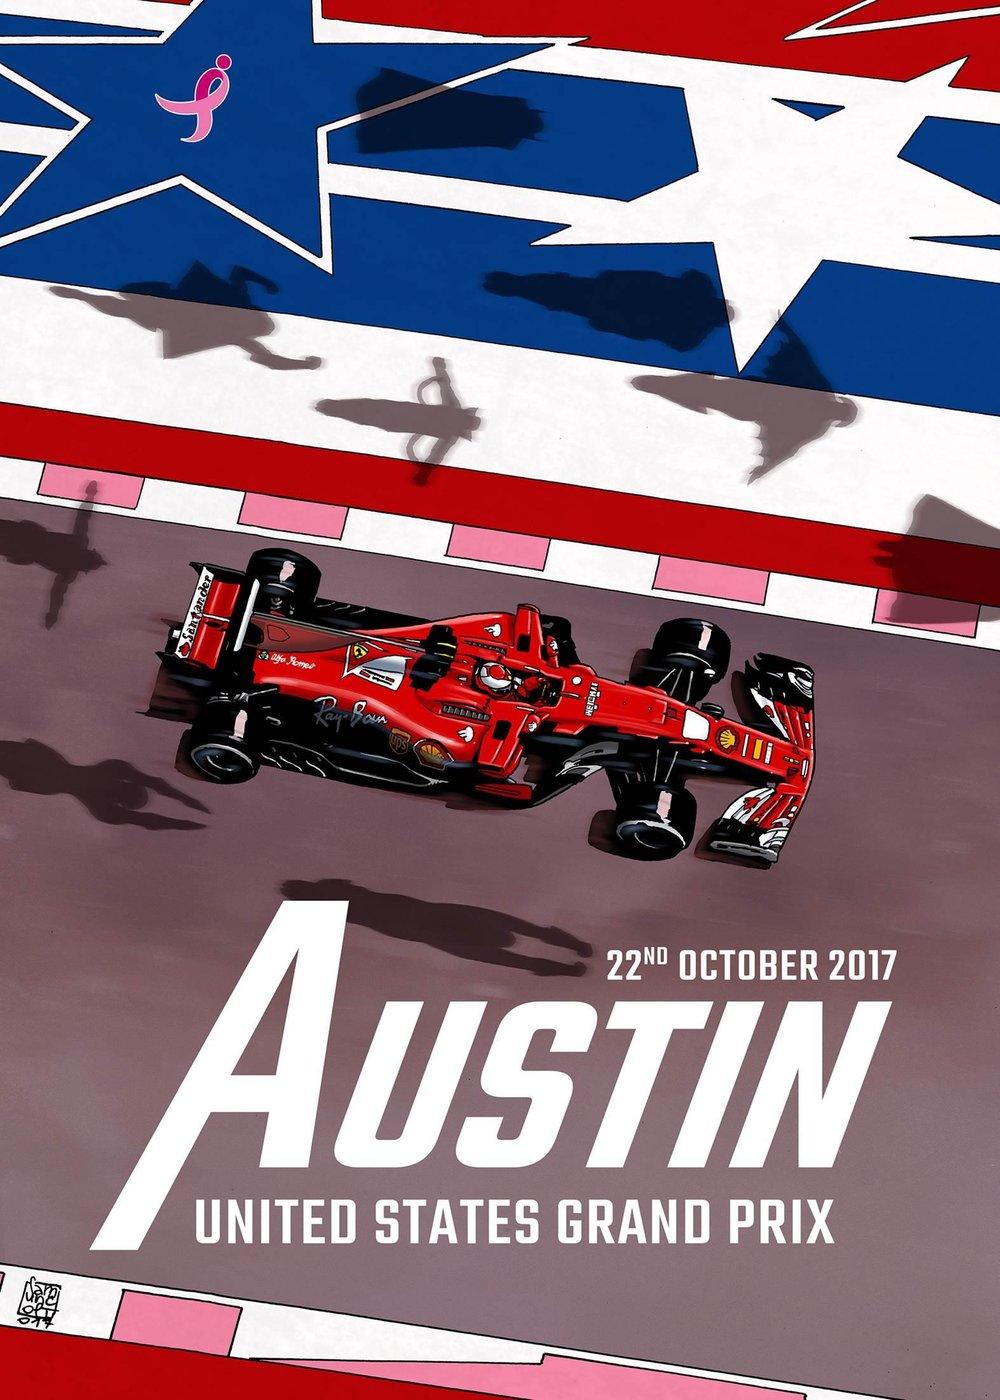 2017 United States Grand Prix